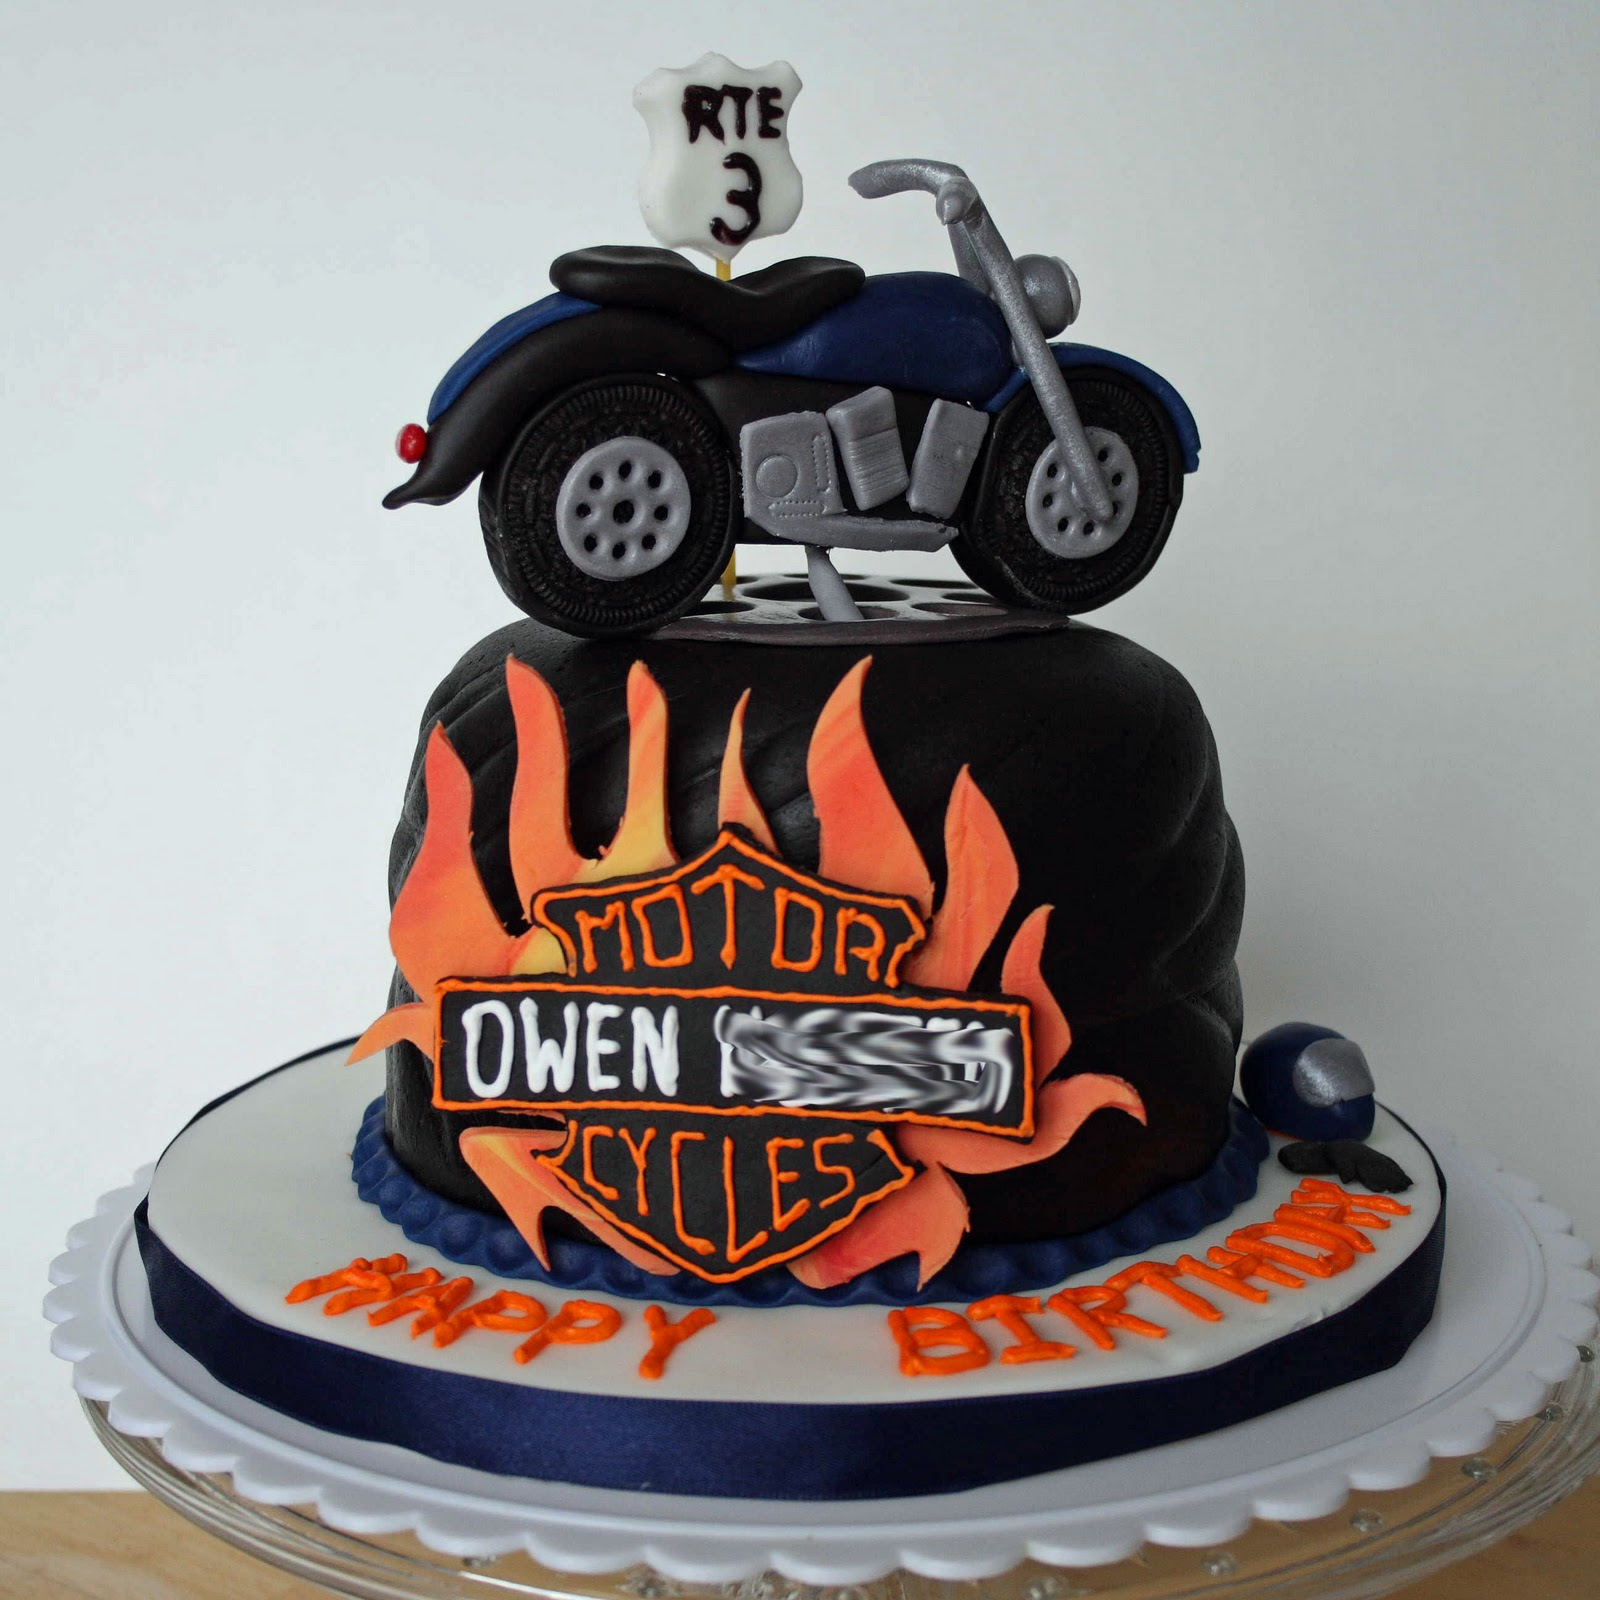 Popular All Kinds of Sugar: Motorcycle Birthday Cake CI62